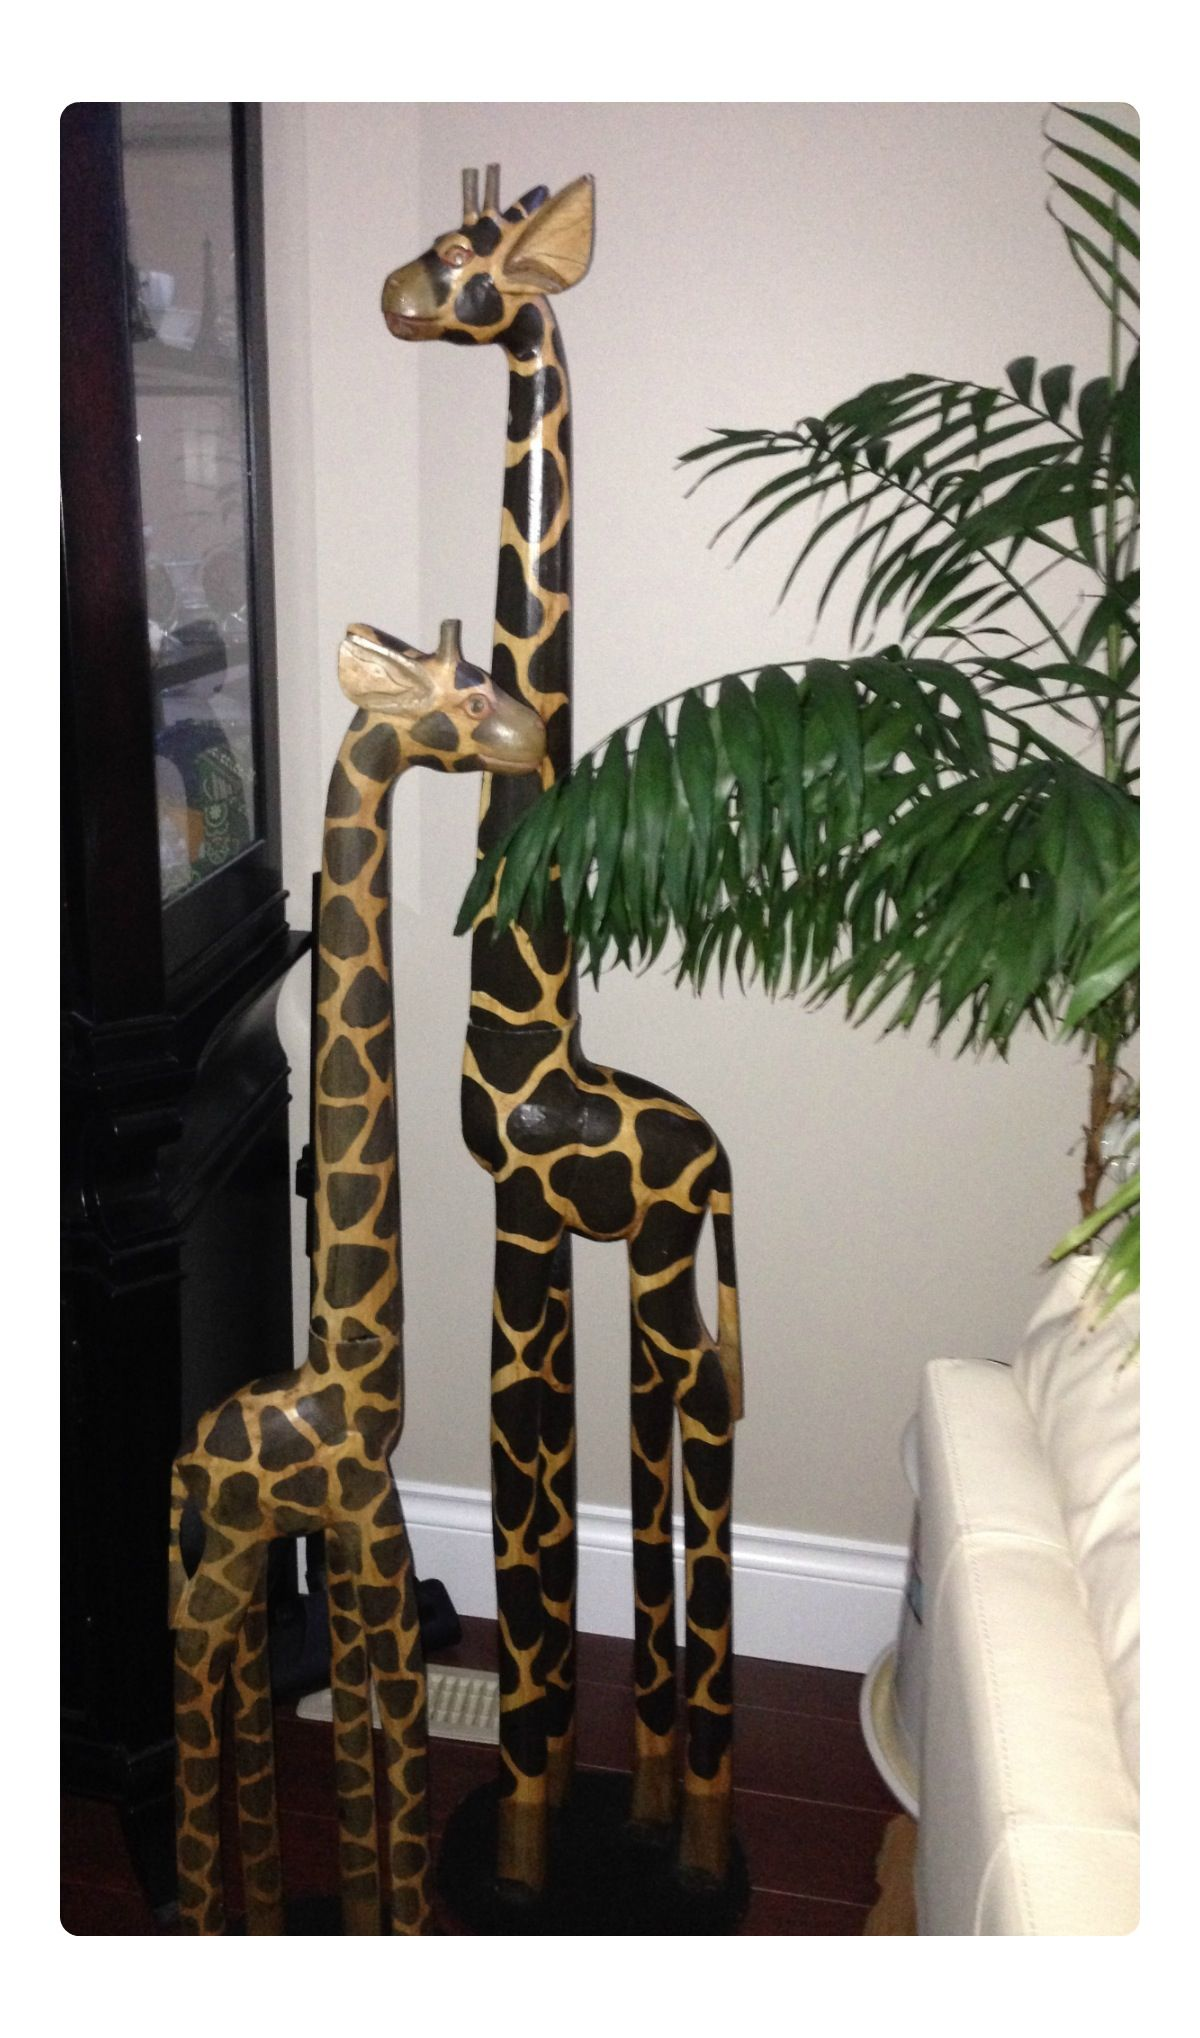 Pin By Iyshia Brenner On Home Ideas Giraffe Decor Animal Decor Giraffes Statues